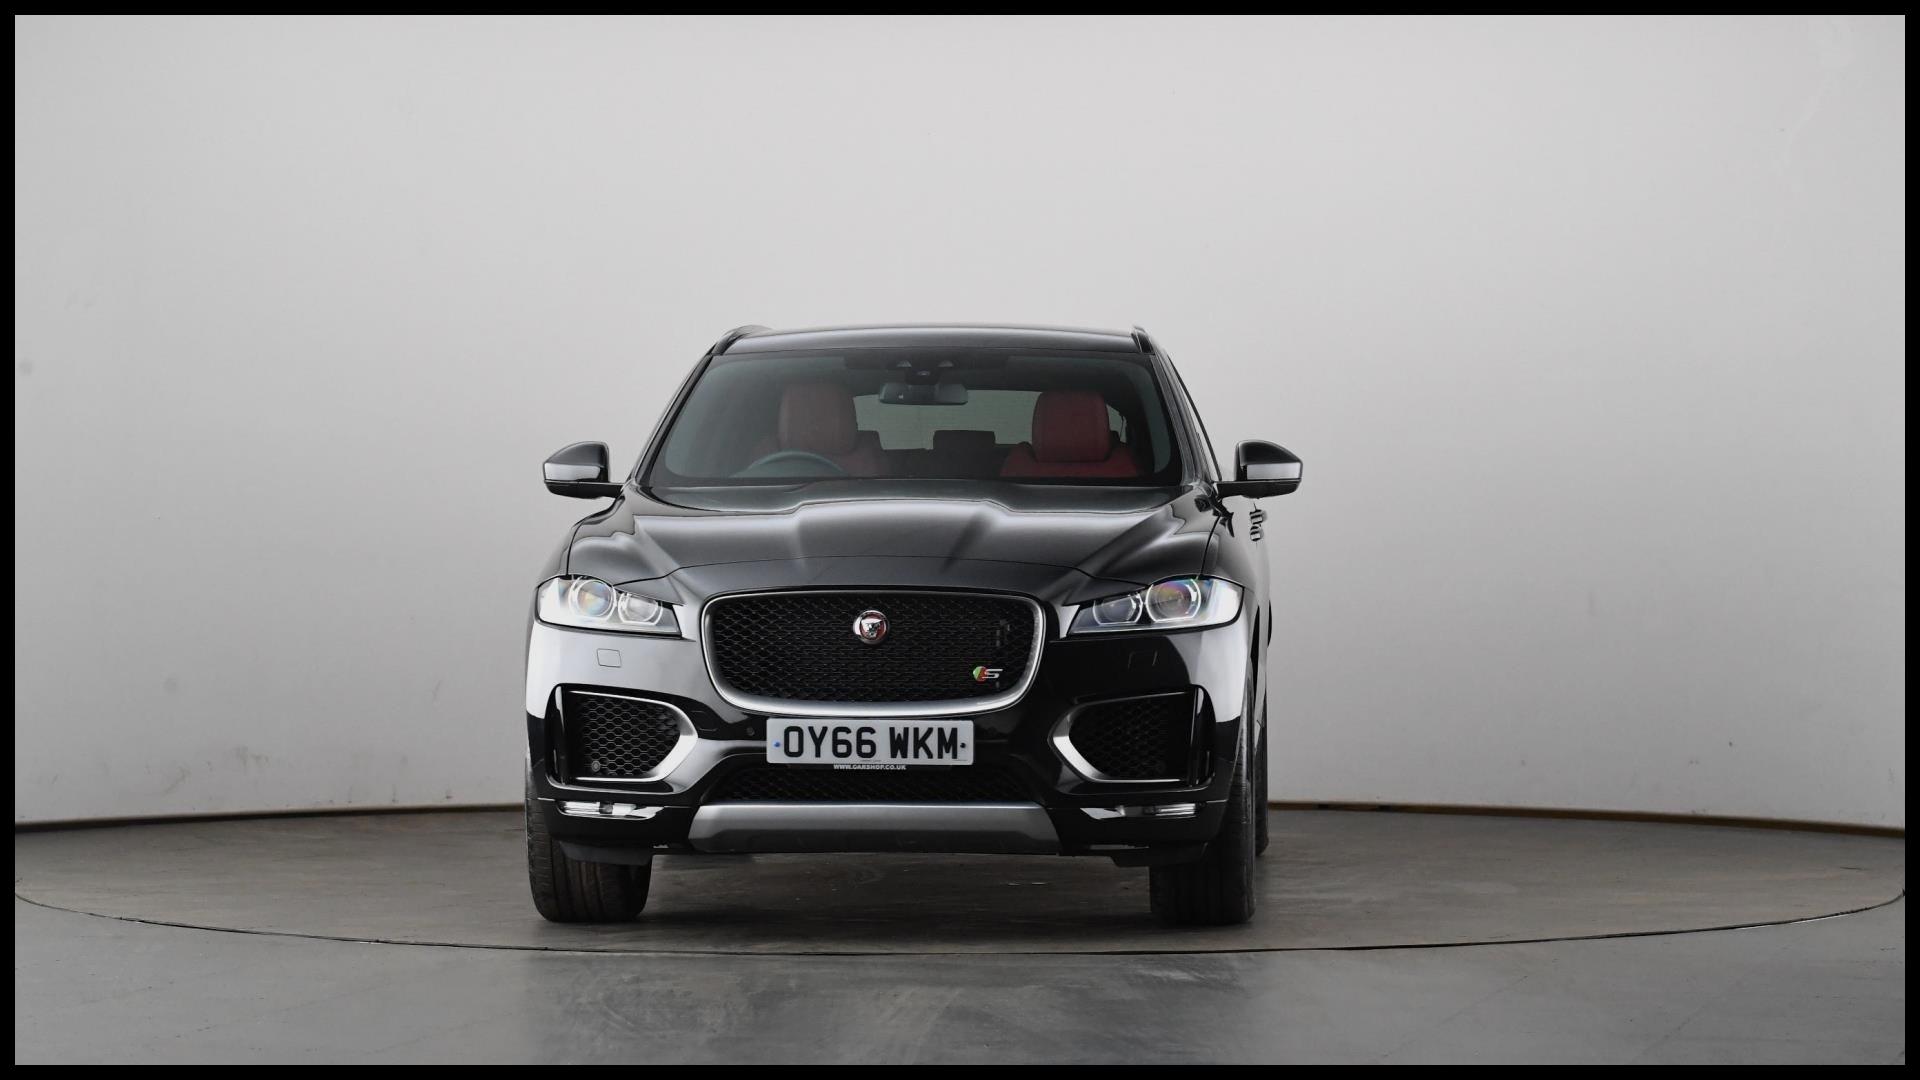 New Model Car 2016 Beautiful Special Bmw New Car Innovative Black Cars S Bmw X3 Xdrive